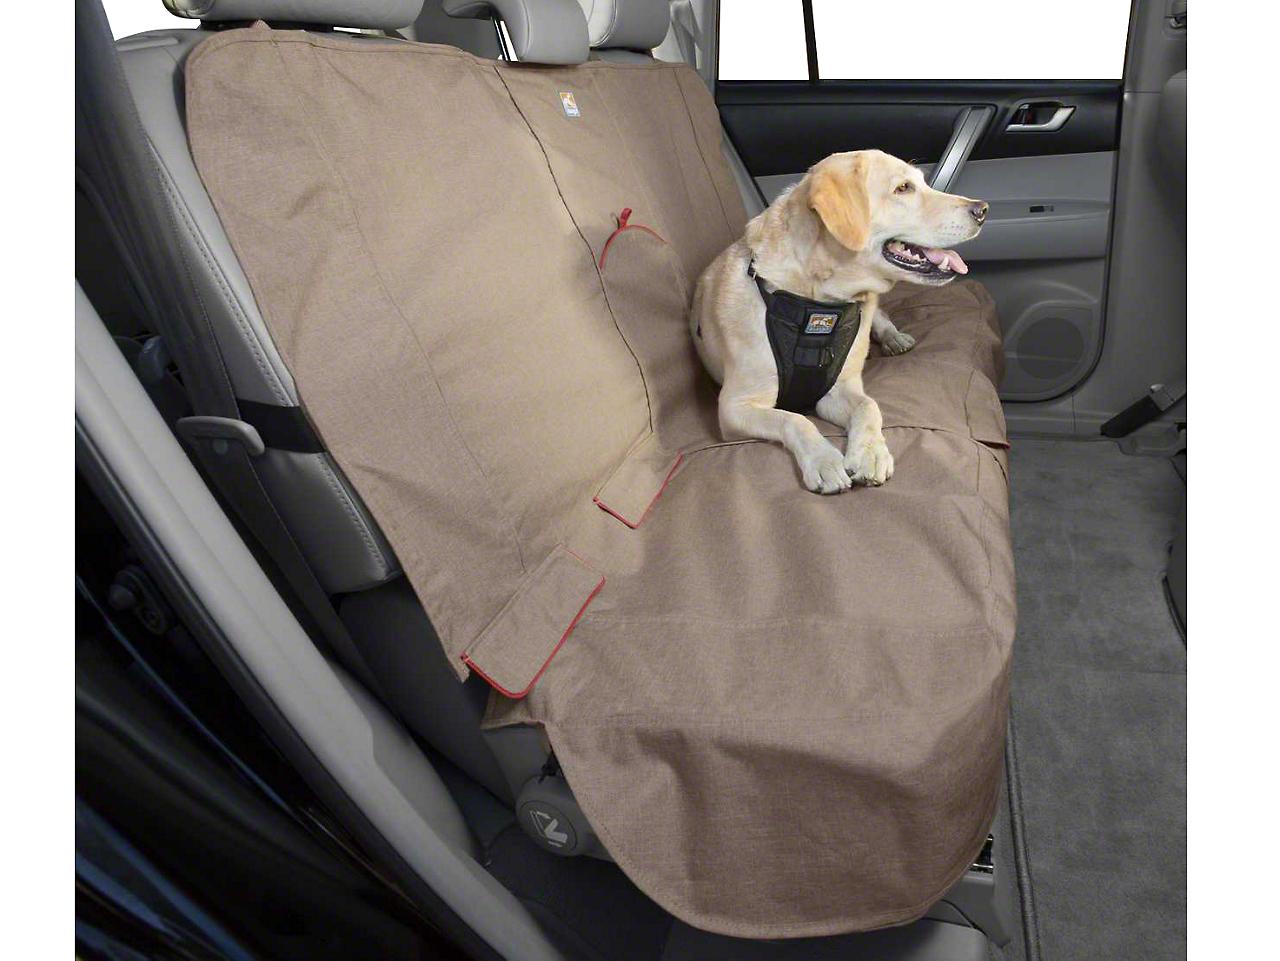 Kurgo Rear Bench Seat Cover - Heather - Nutmeg (02-19 RAM 1500 Quad Cab, Crew Cab, Mega Cab)